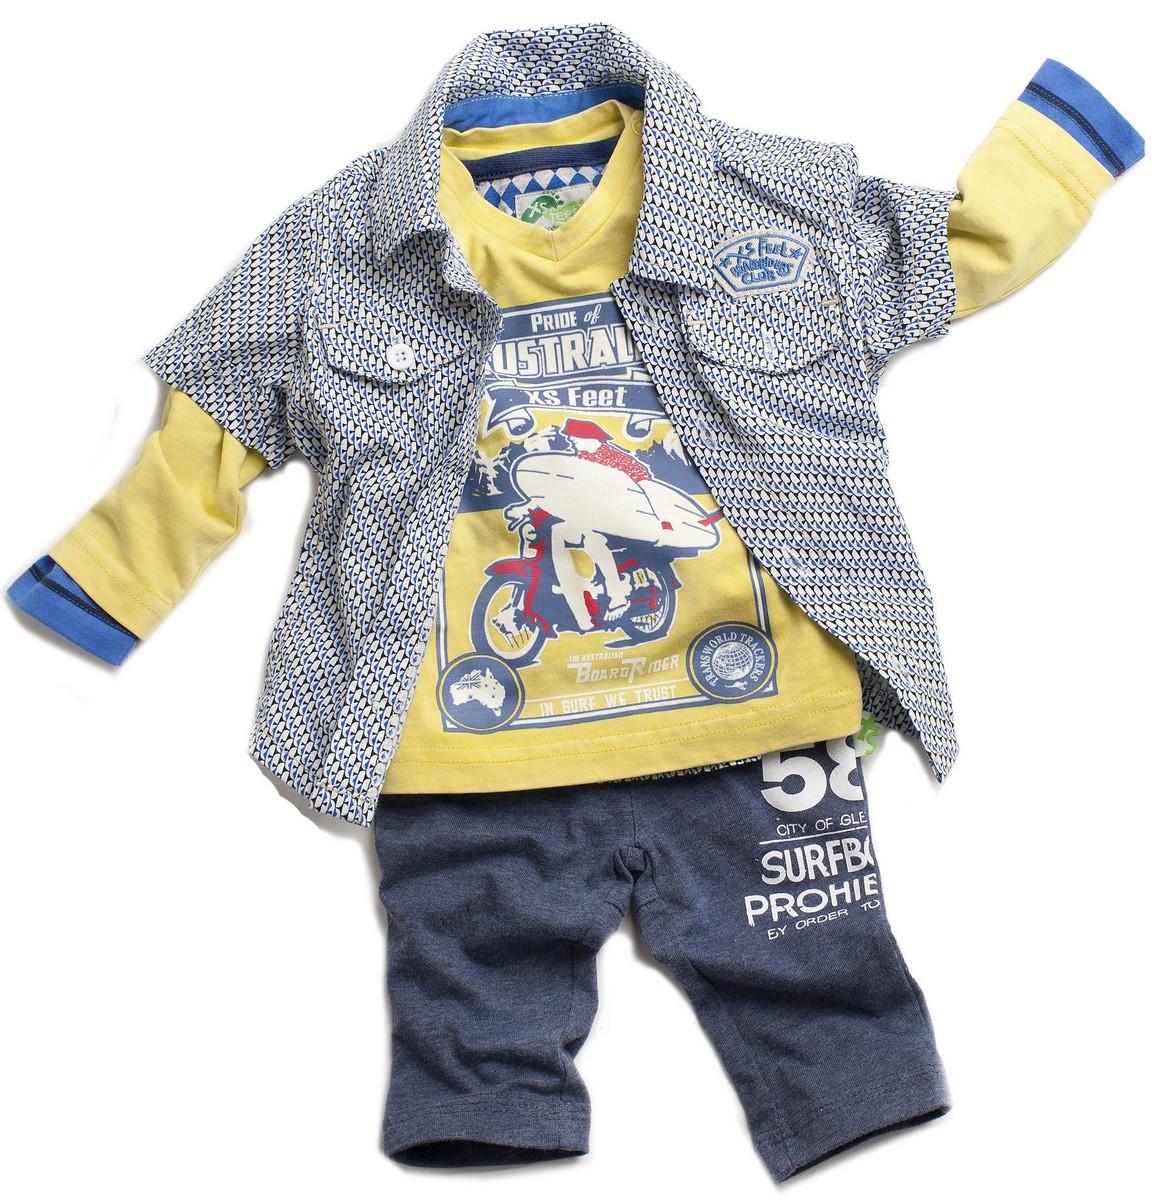 Kinderkleding Webwinkel.Online Kinderkleding Webwinkel Kleertjeshoek Merk Kinderkleding